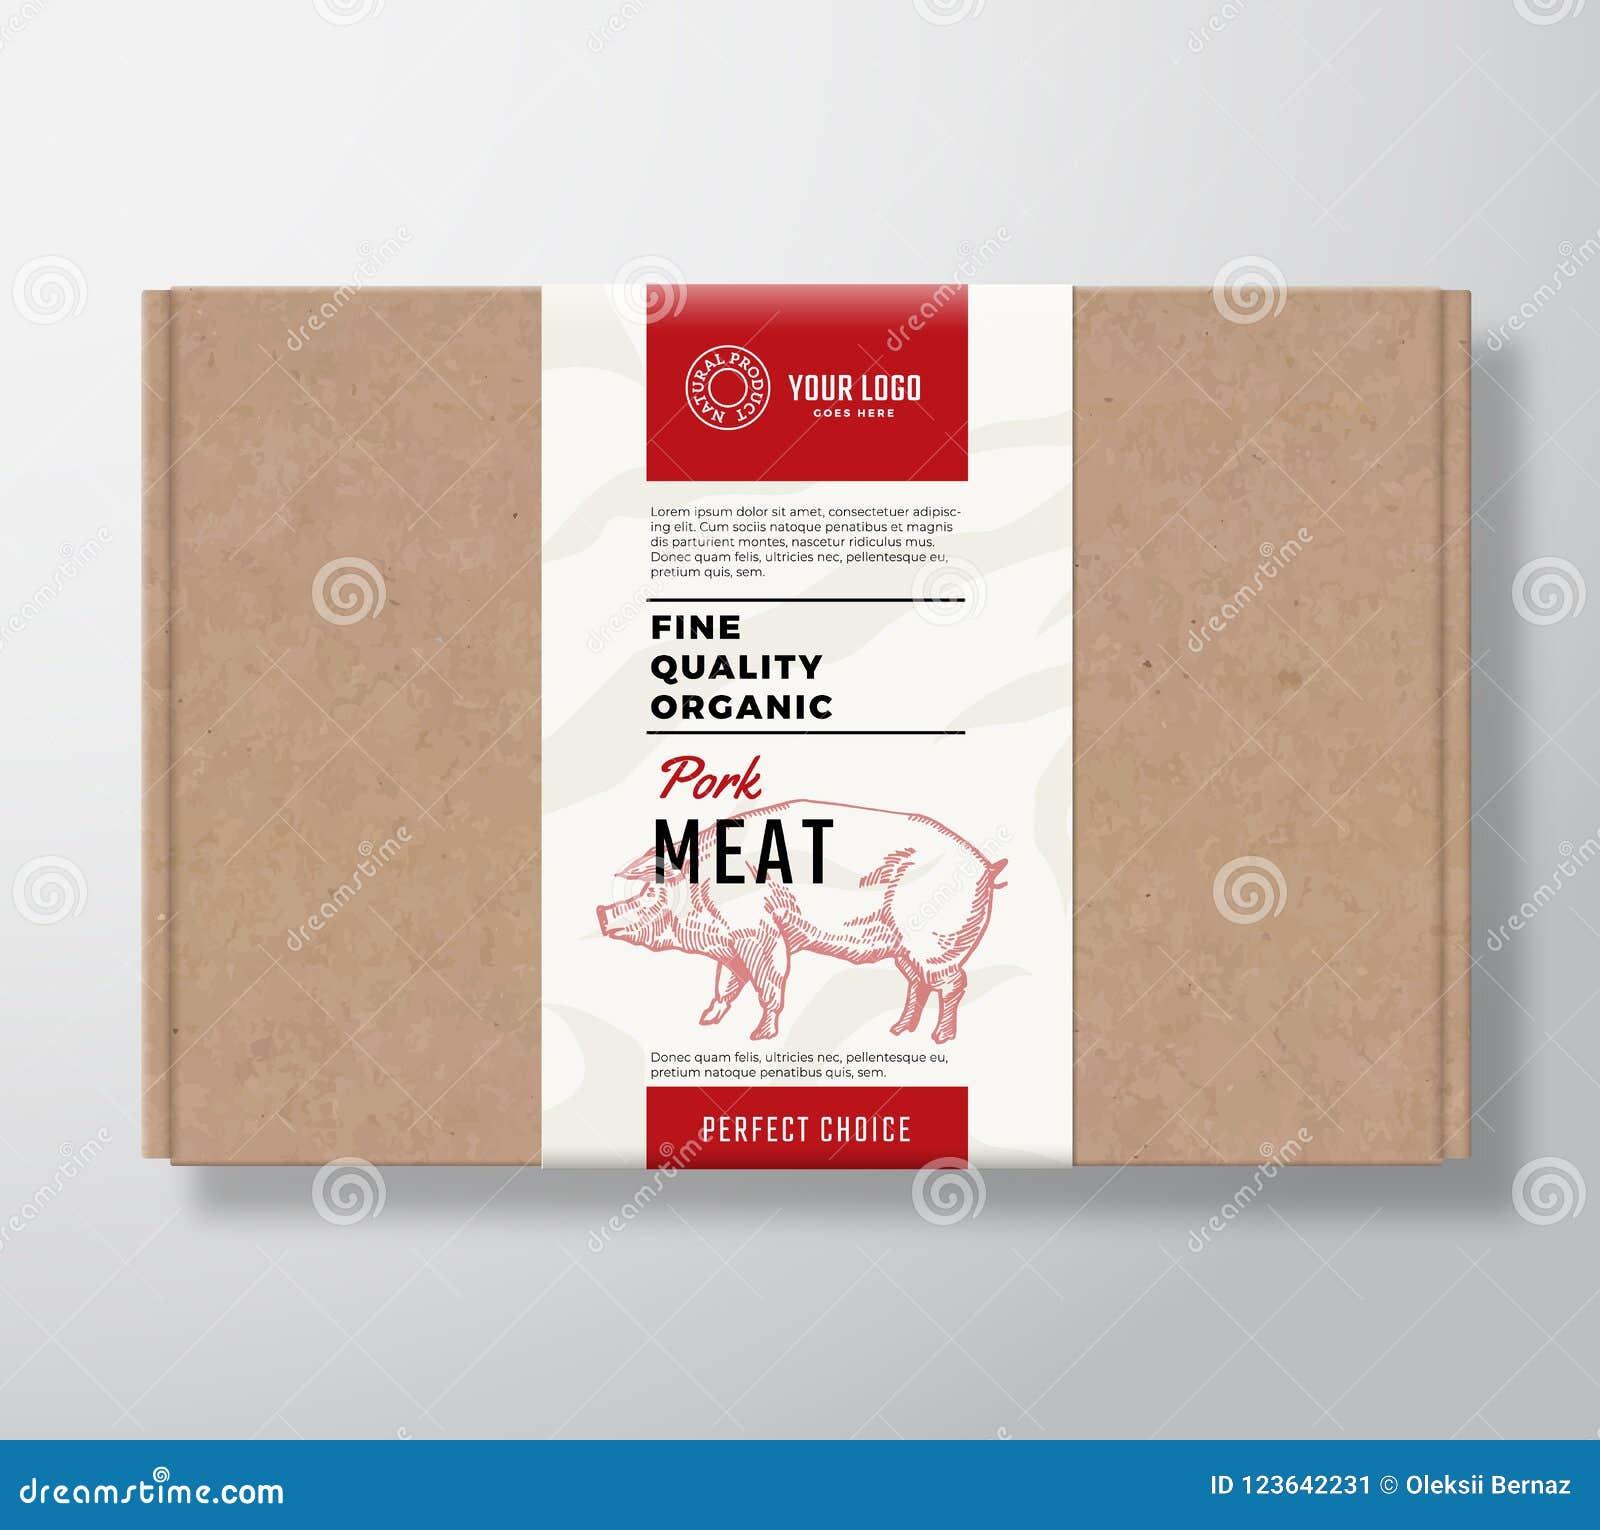 Fine Quality Organic Pork Craft Cardboard Box Abstract Vector Meat